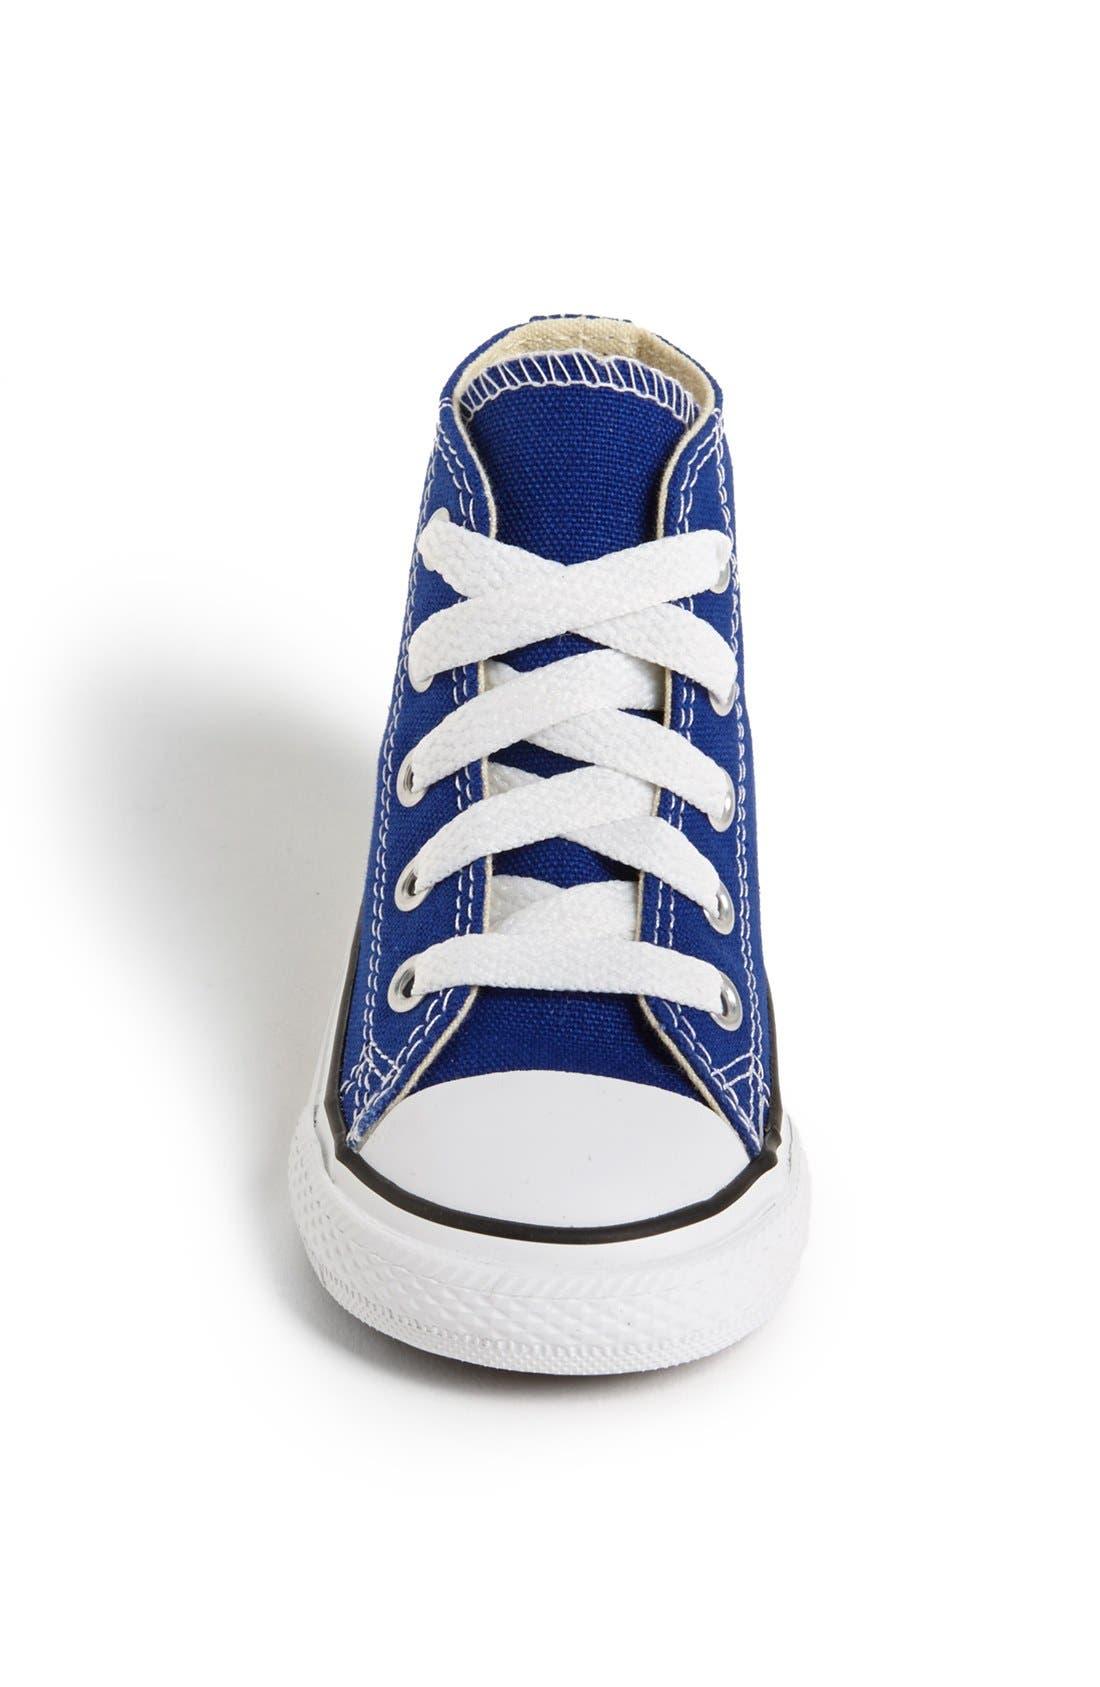 Alternate Image 3  - Converse Chuck Taylor® All Star® High Top Sneaker (Baby, Walker, Toddler & Little Kid)